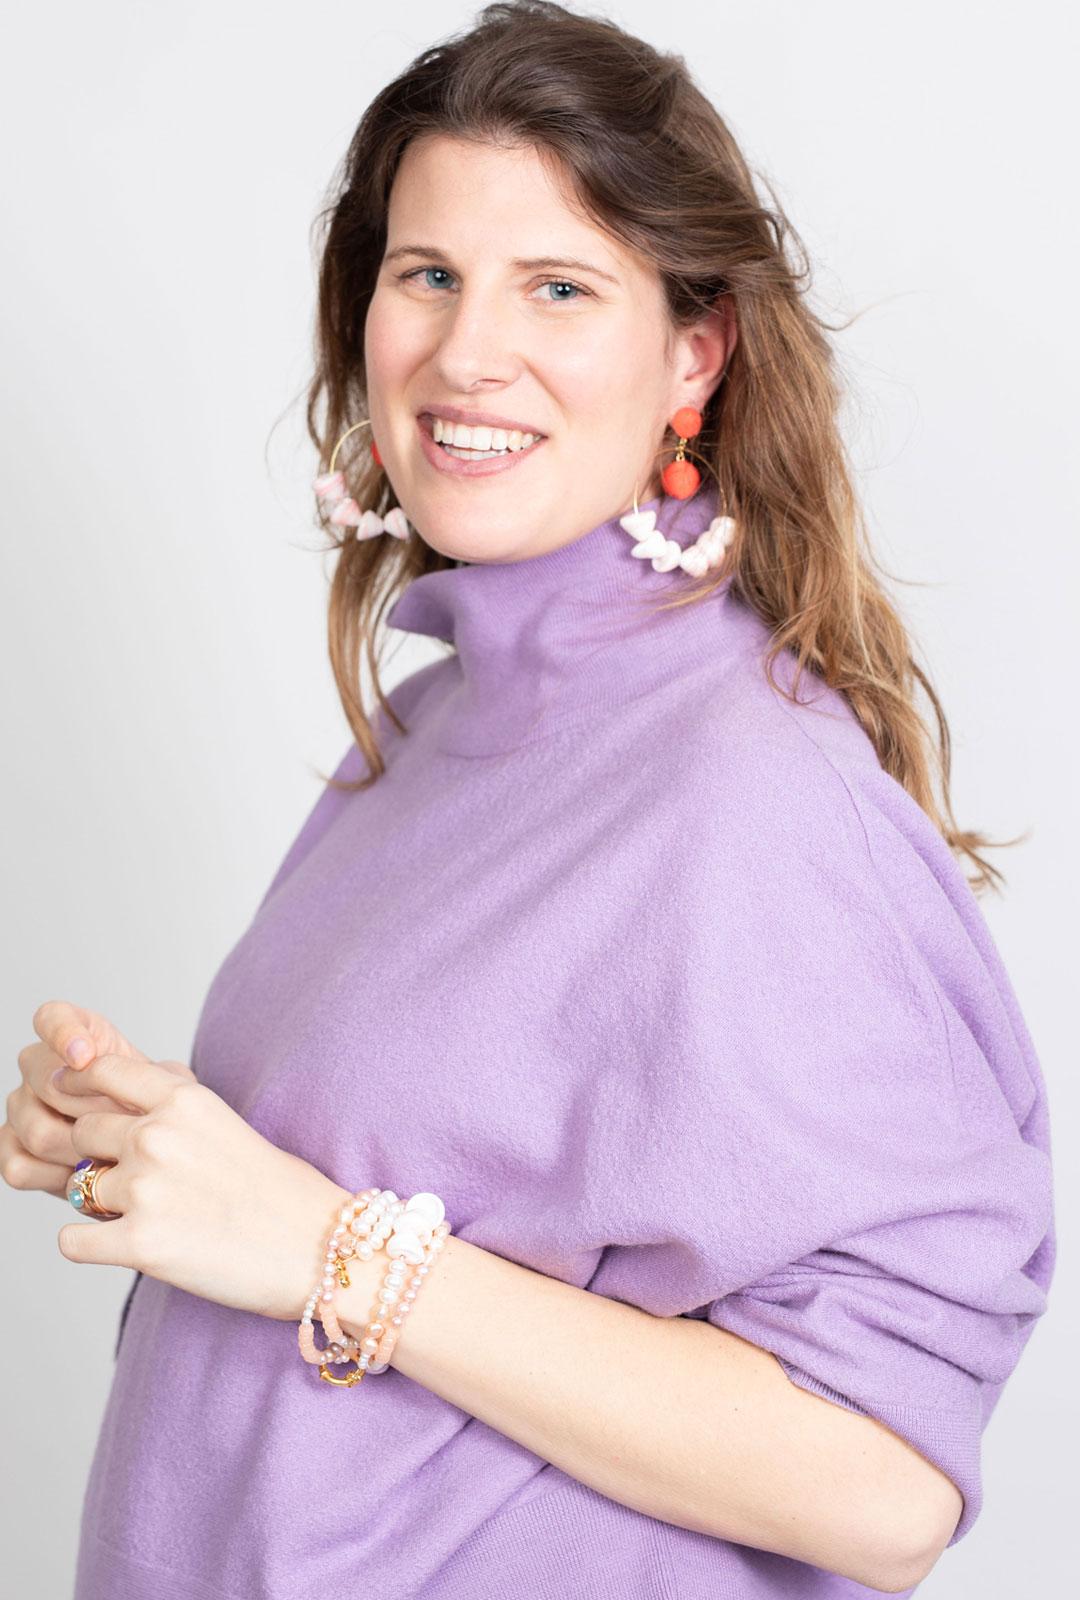 Model mit Lara Lici Kreolen